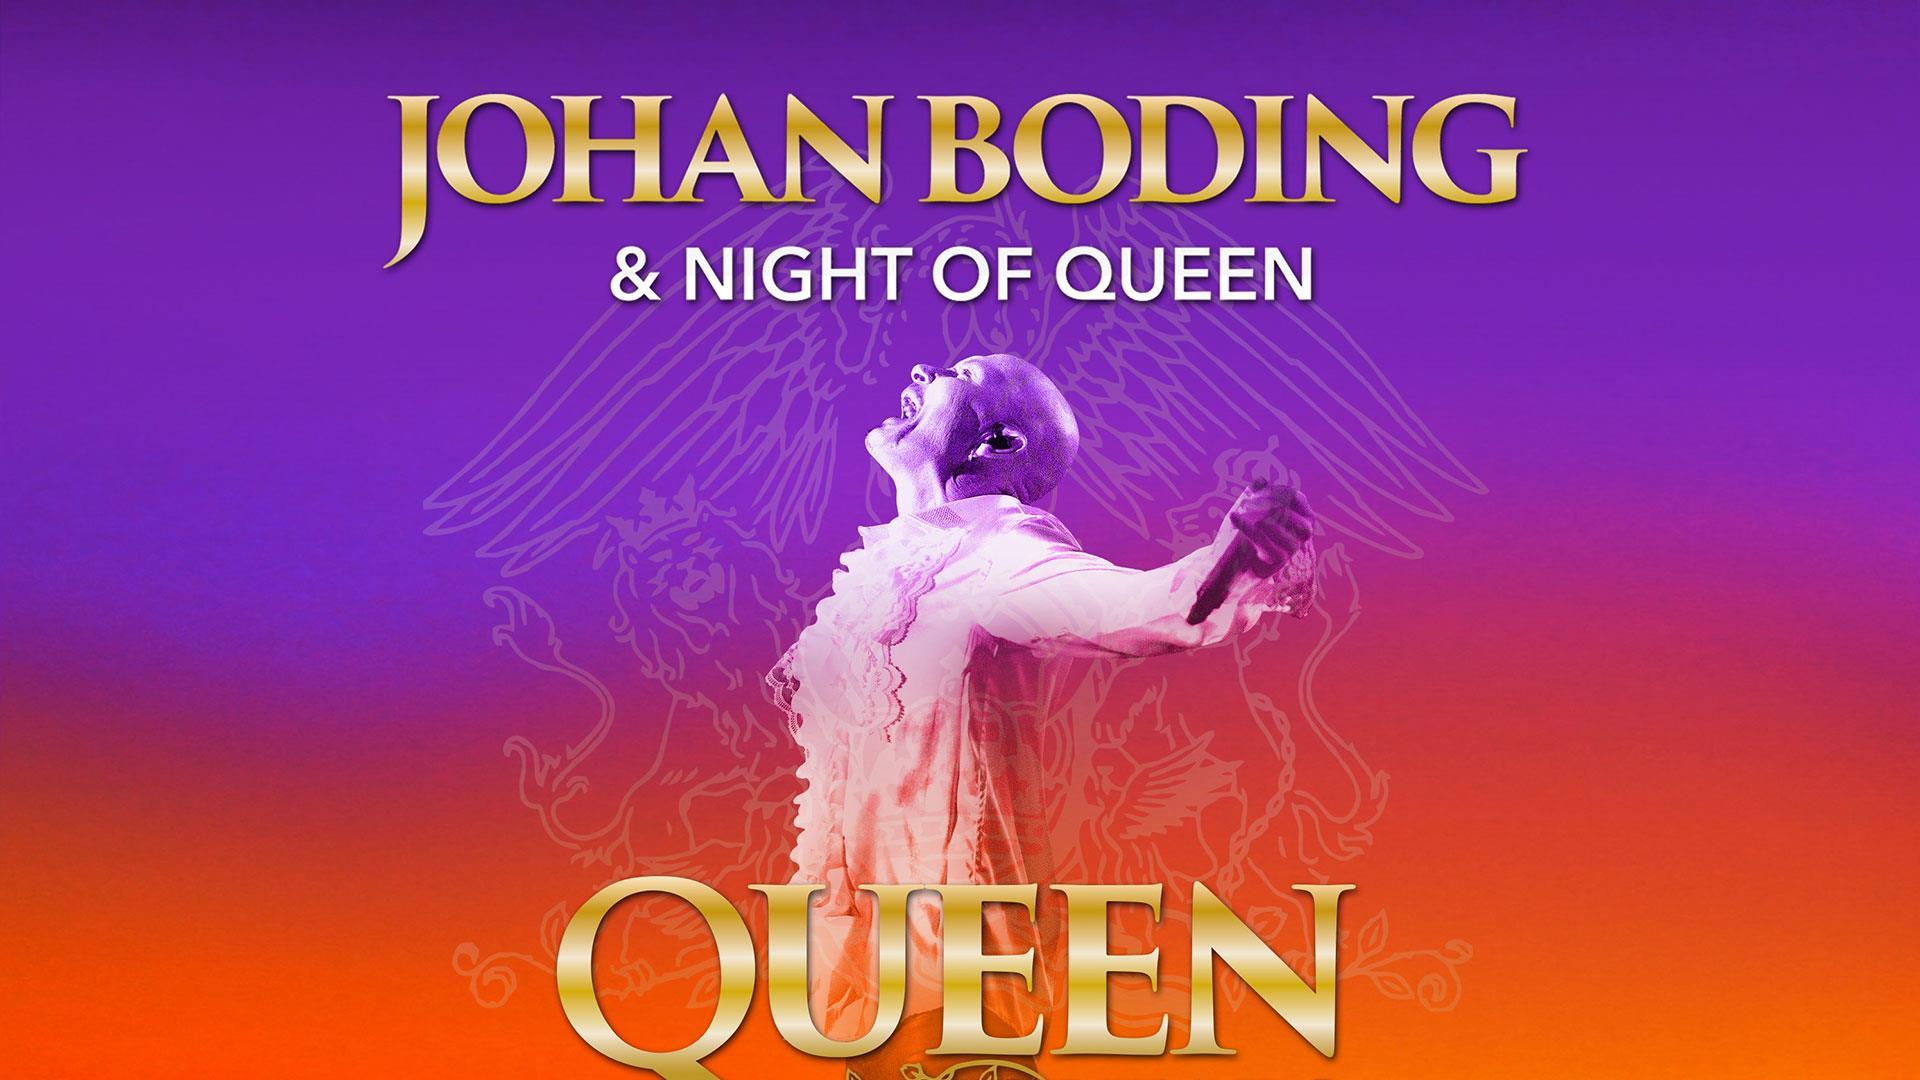 Johan Boding & Night of Queen, Queen 50 years - INSTÄLLT